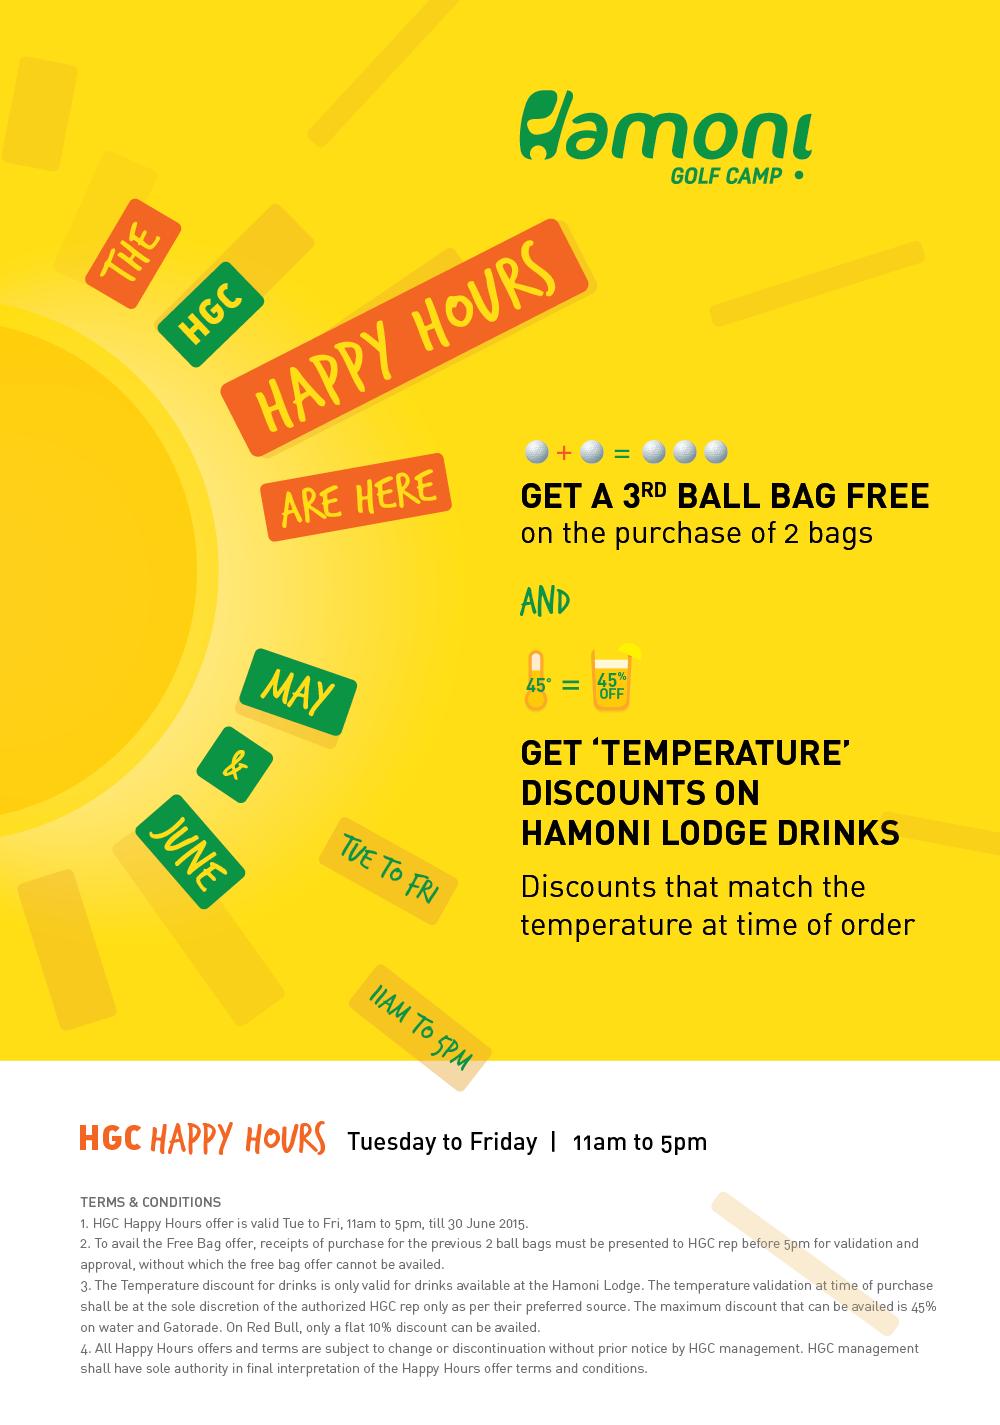 Happy Hours at Hamoni Golf Camp!